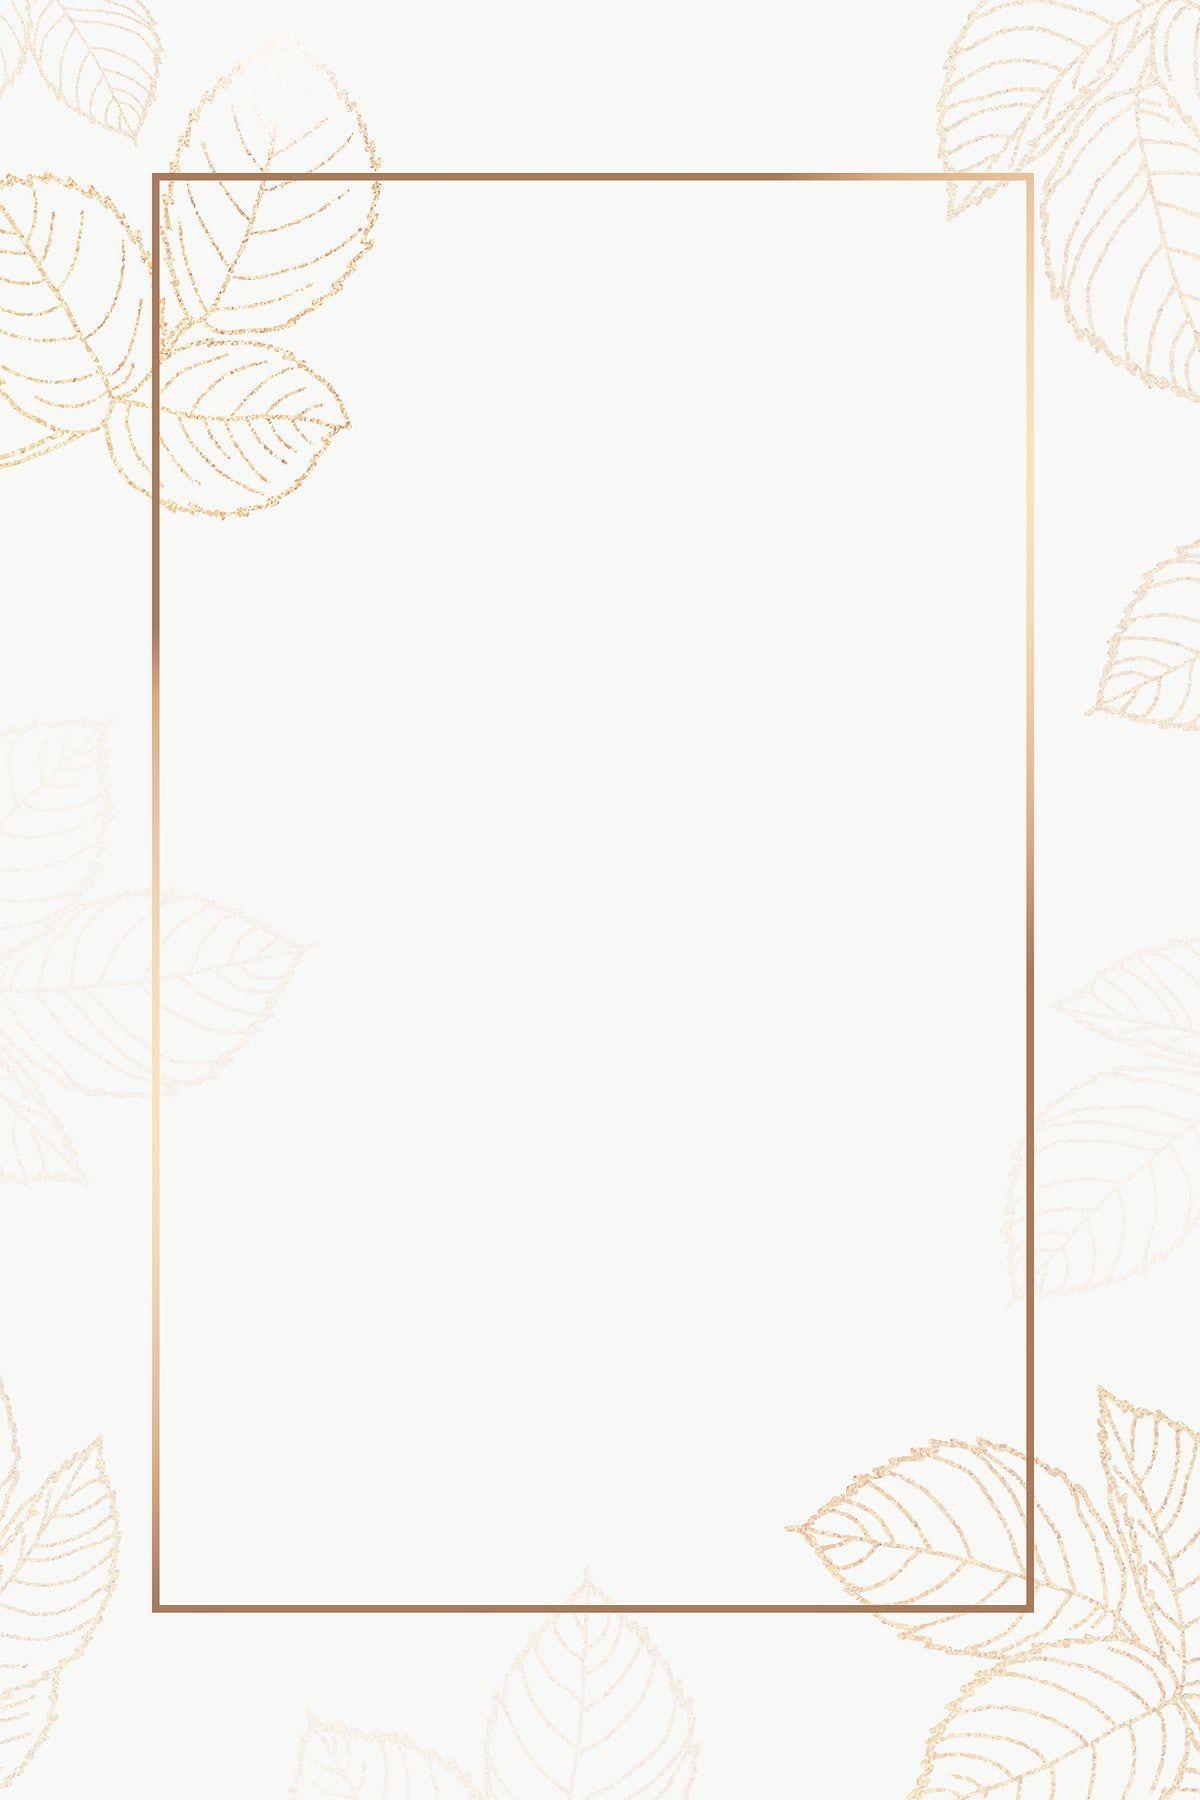 Download free png of Leafy golden rectangle frame design element  by Adjima about frame, gold frames, gold, floral, and frame png 2409349